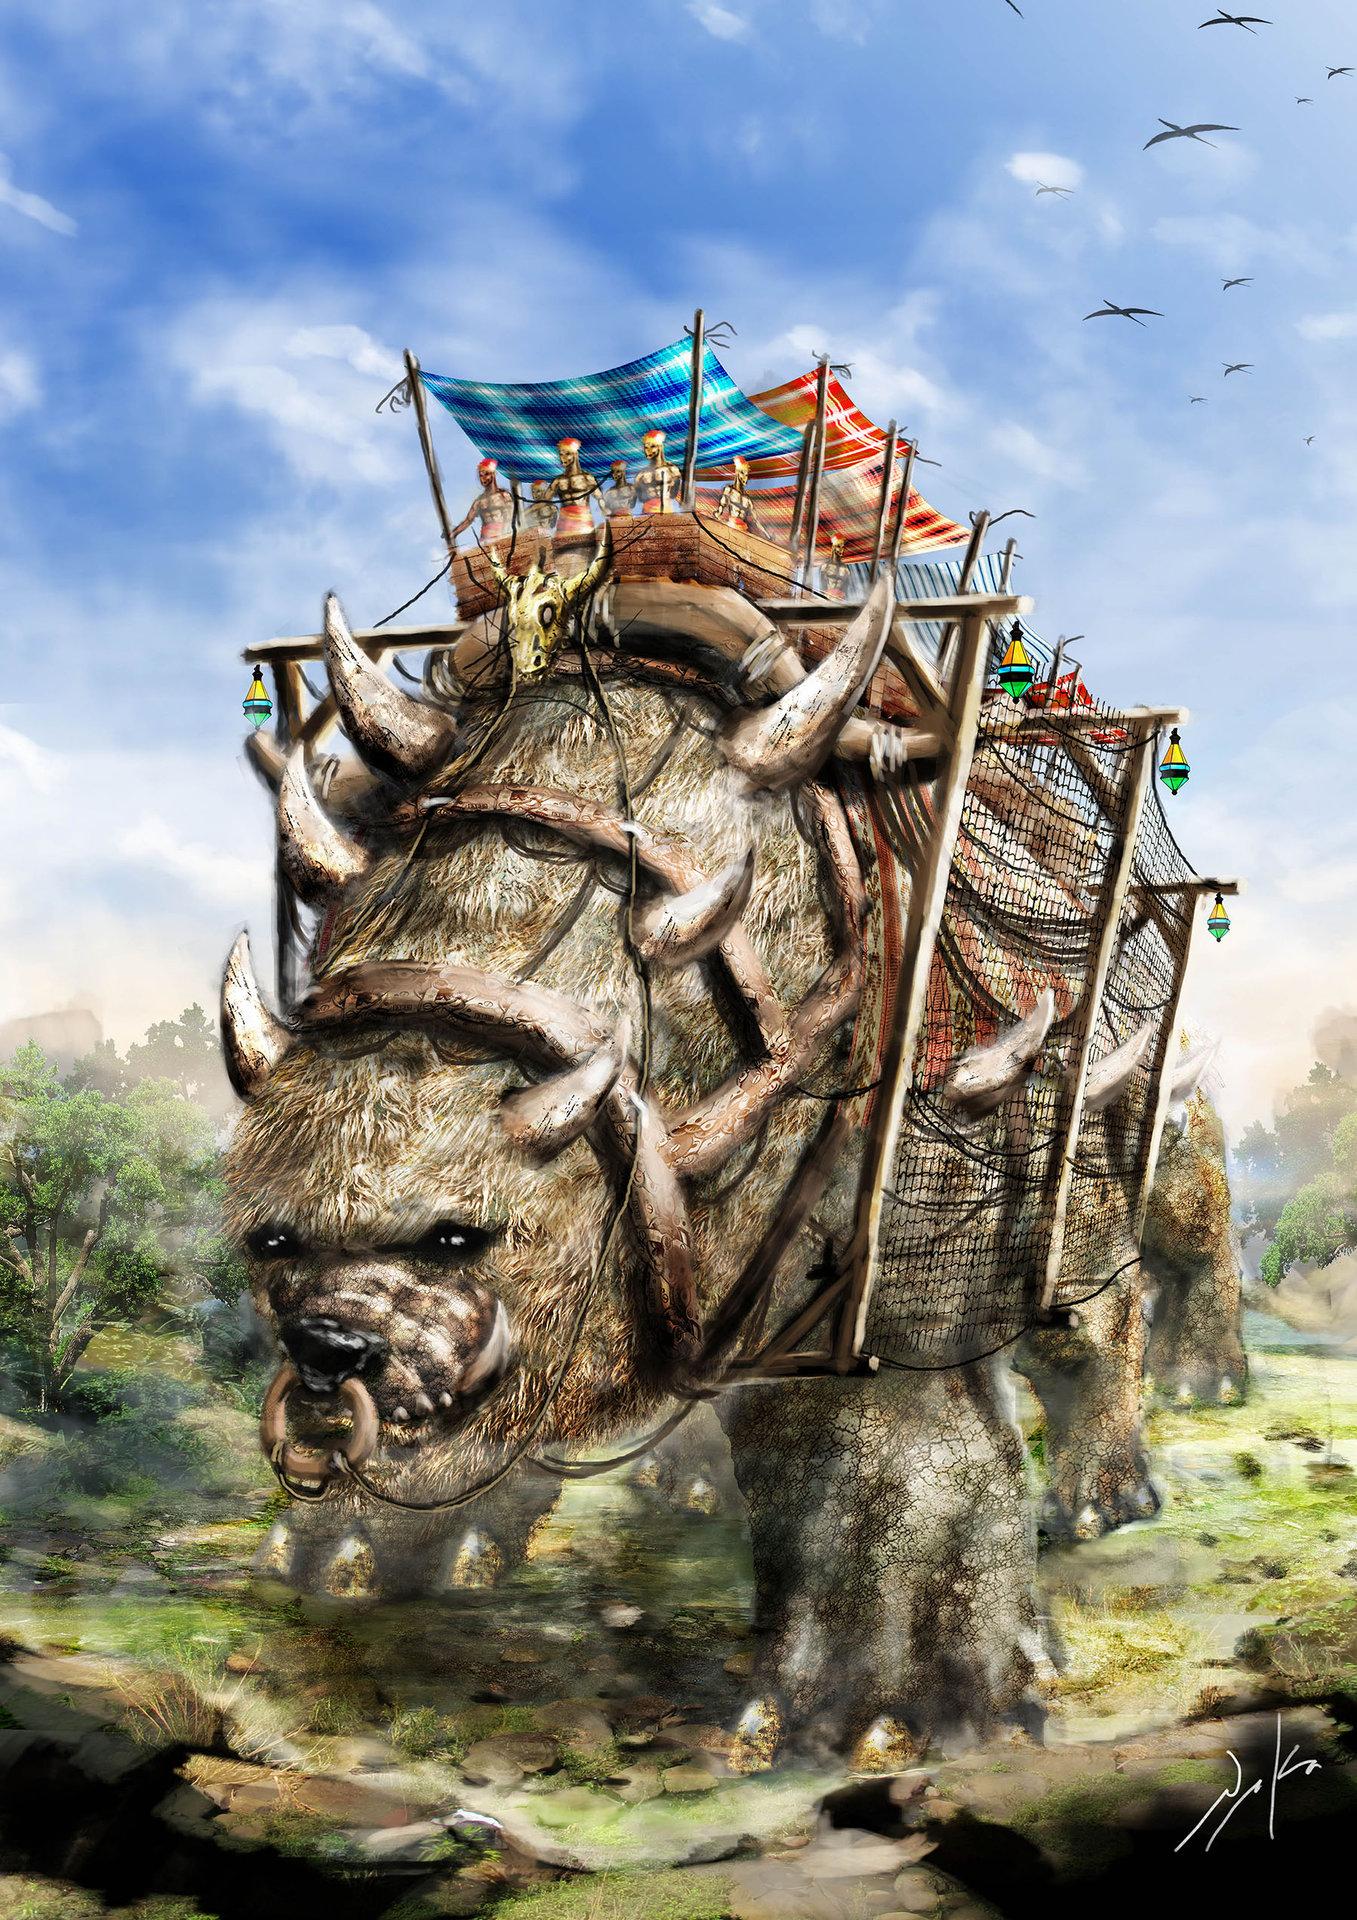 The Big Bus Beast